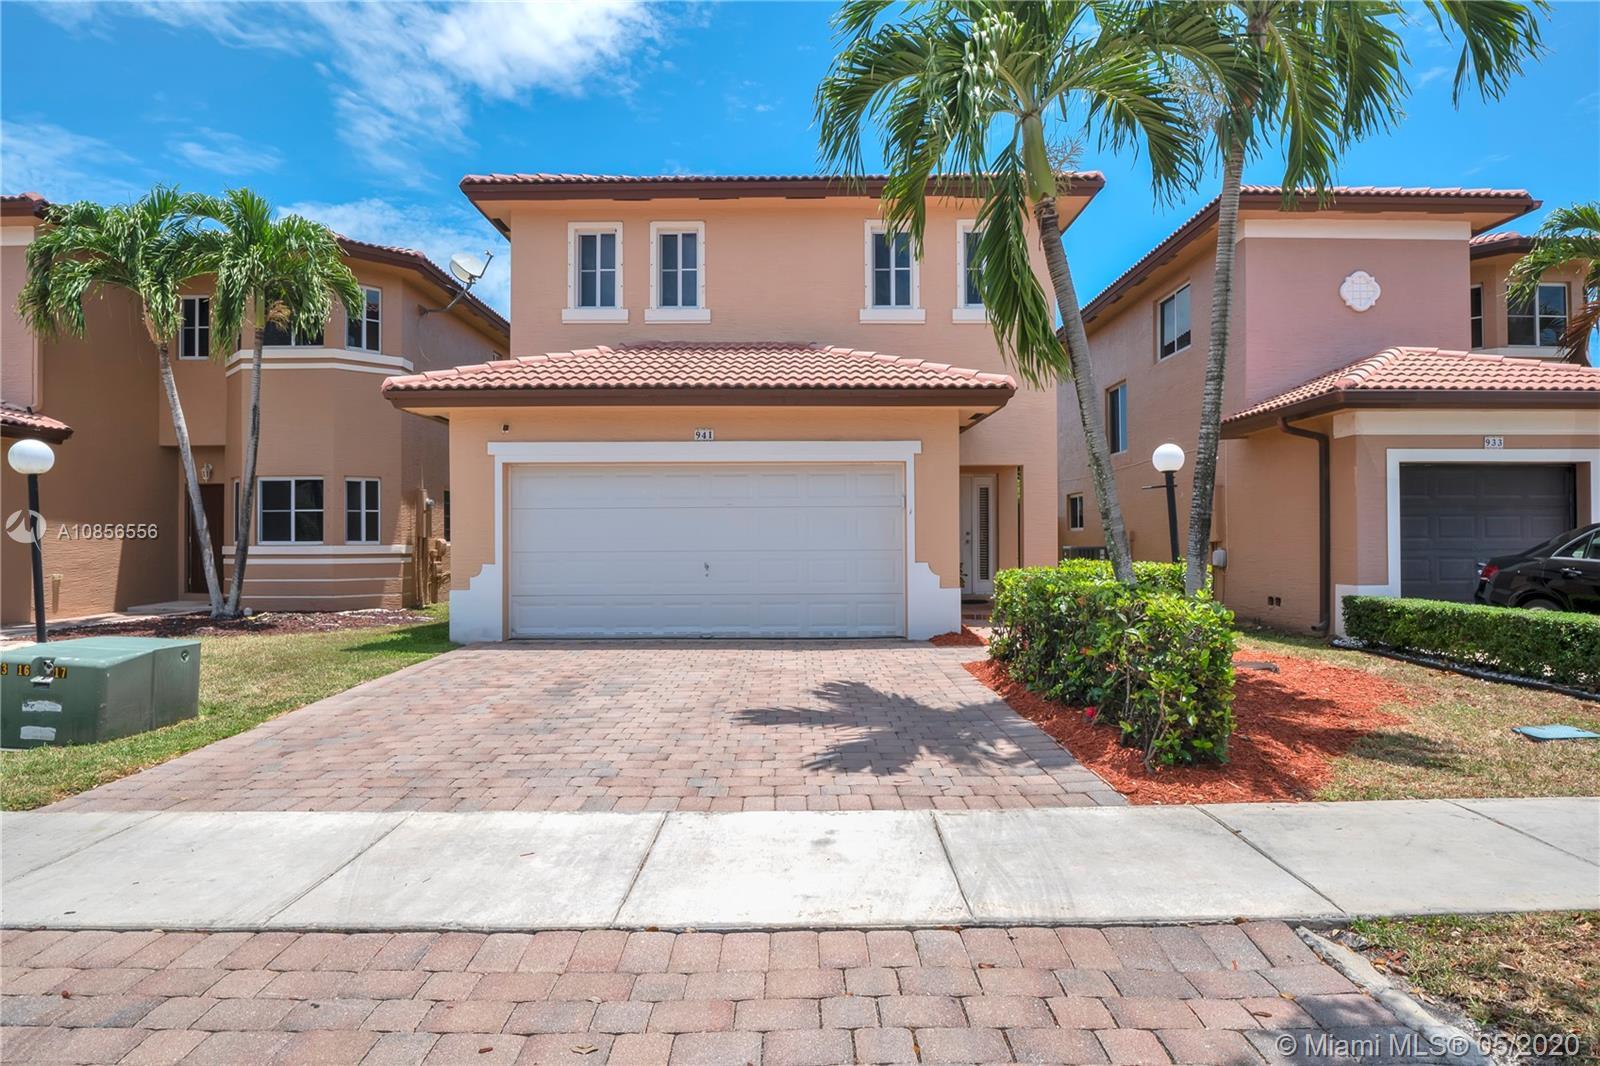 941 NE 41st Ave, Homestead, FL 33033 - Homestead, FL real estate listing